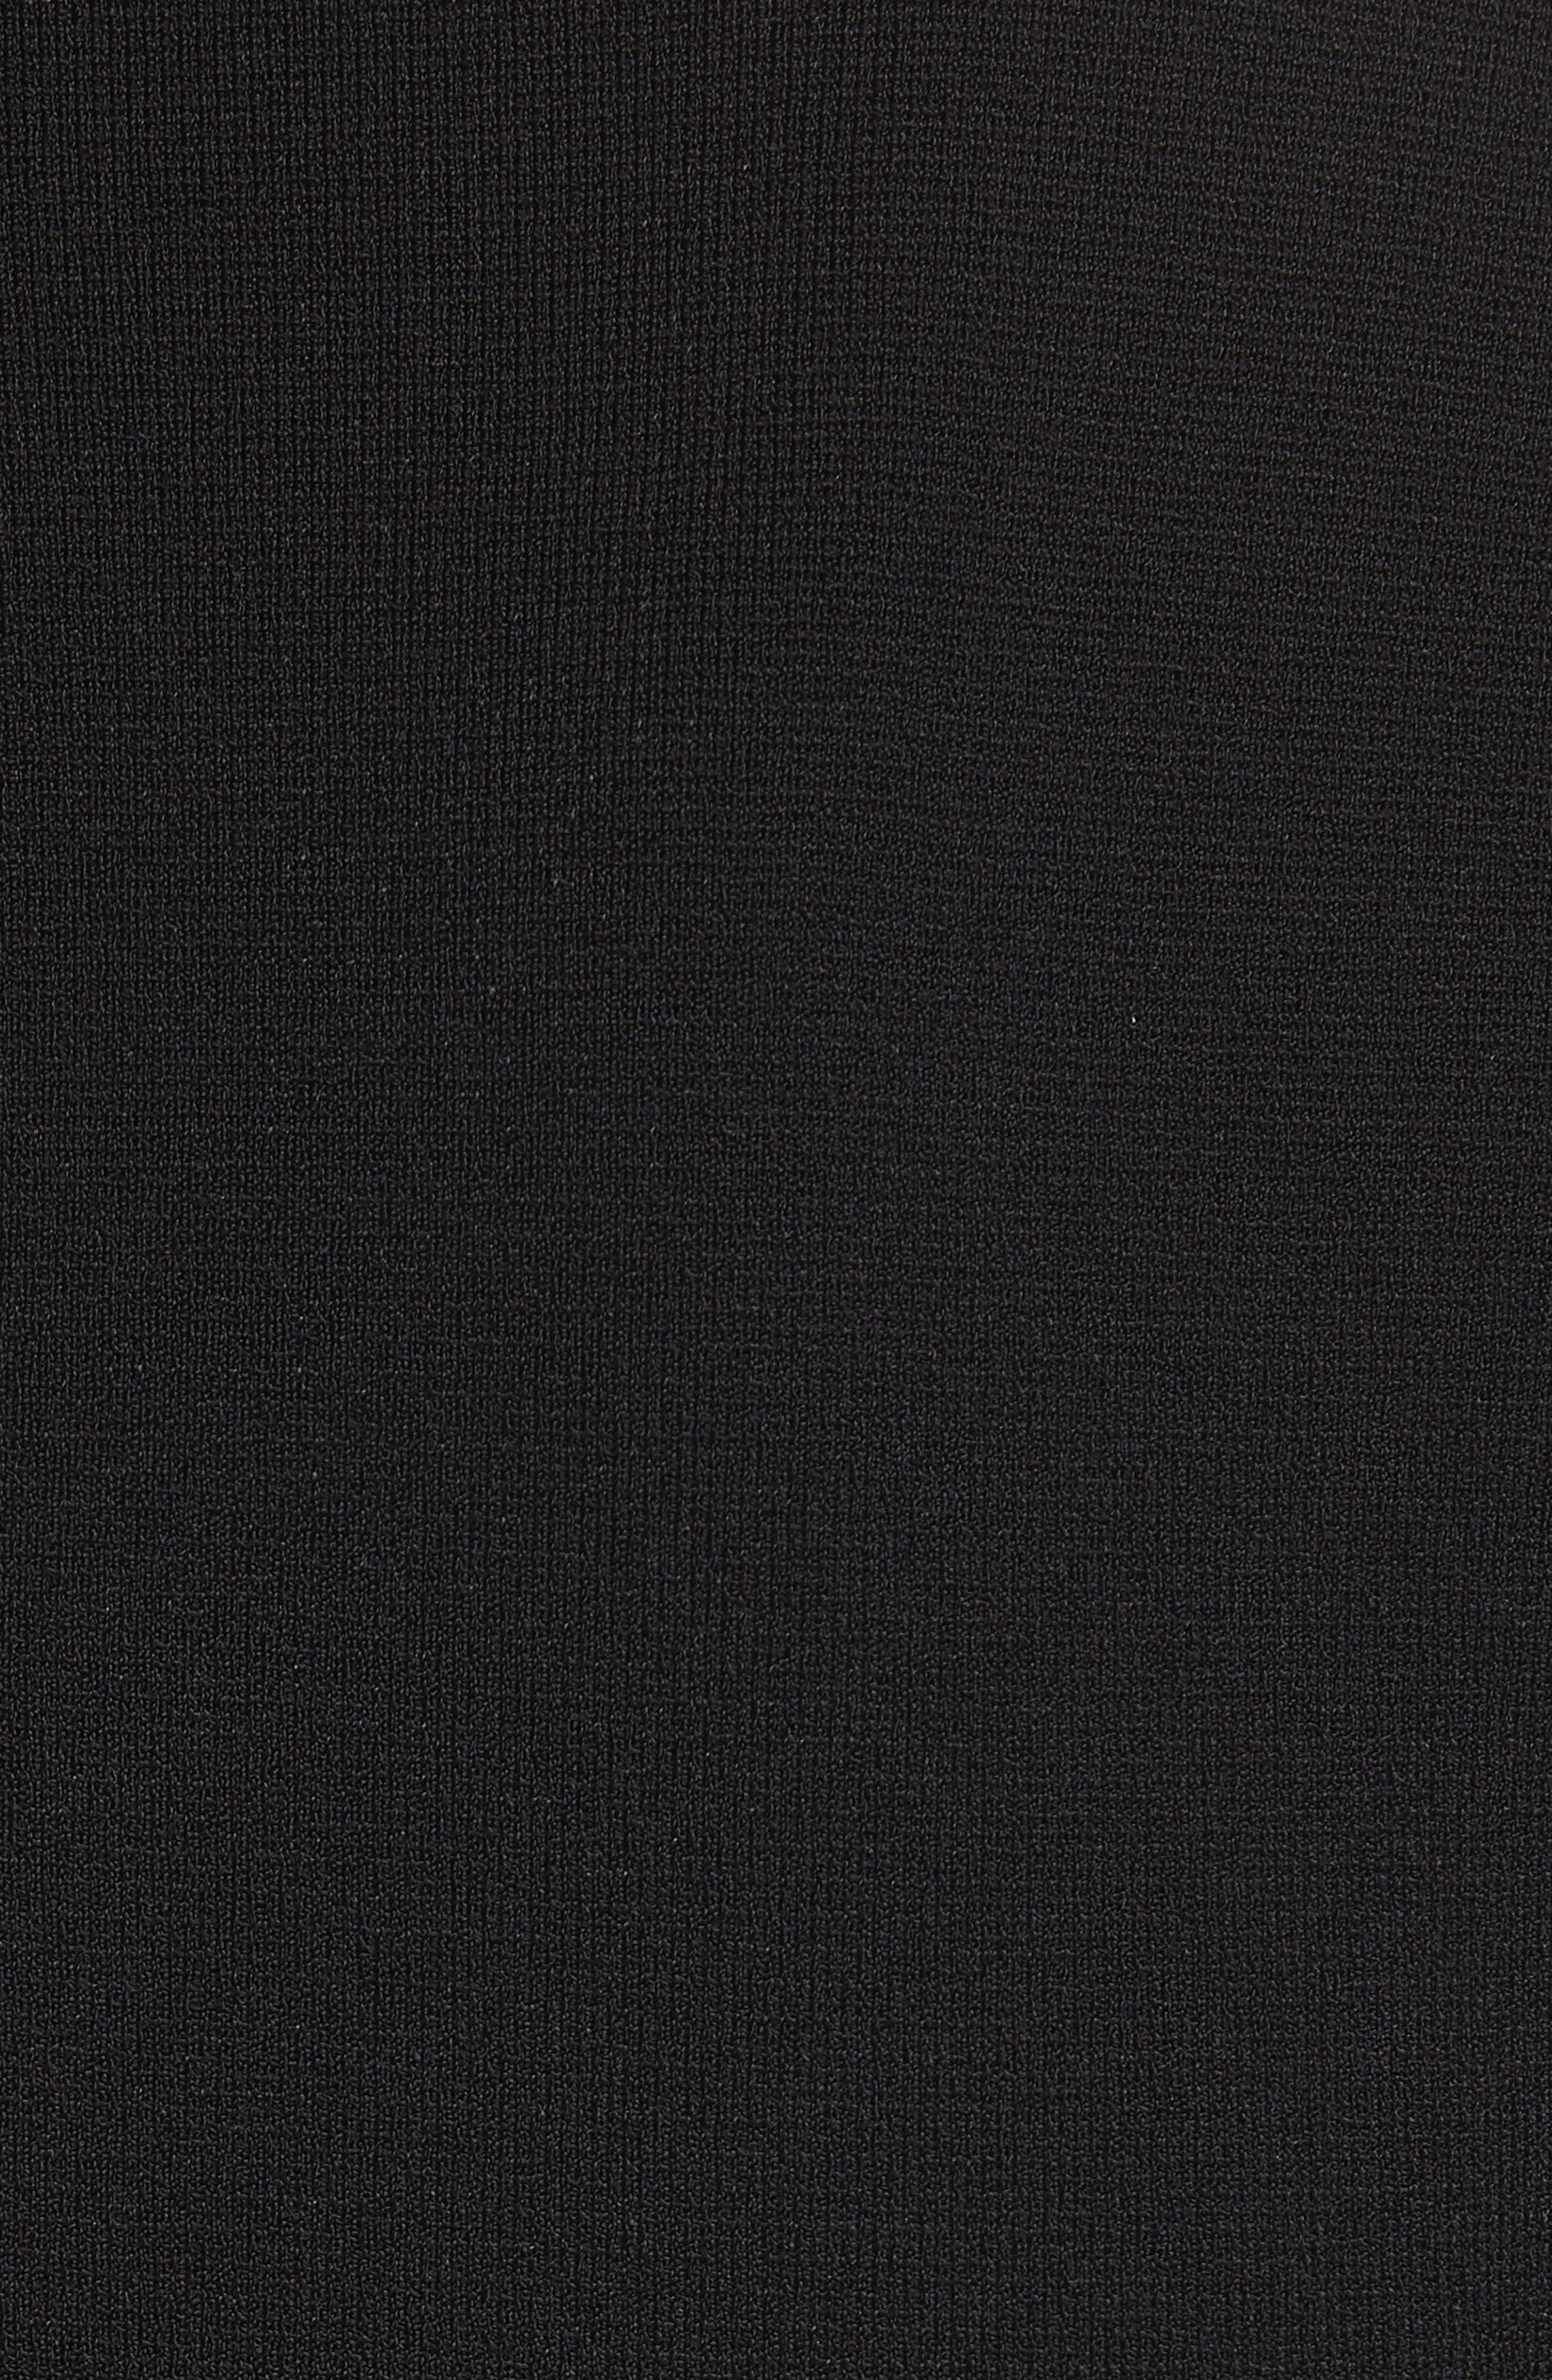 Balloon Sleeve Milano Stitch Dress,                             Alternate thumbnail 5, color,                             001